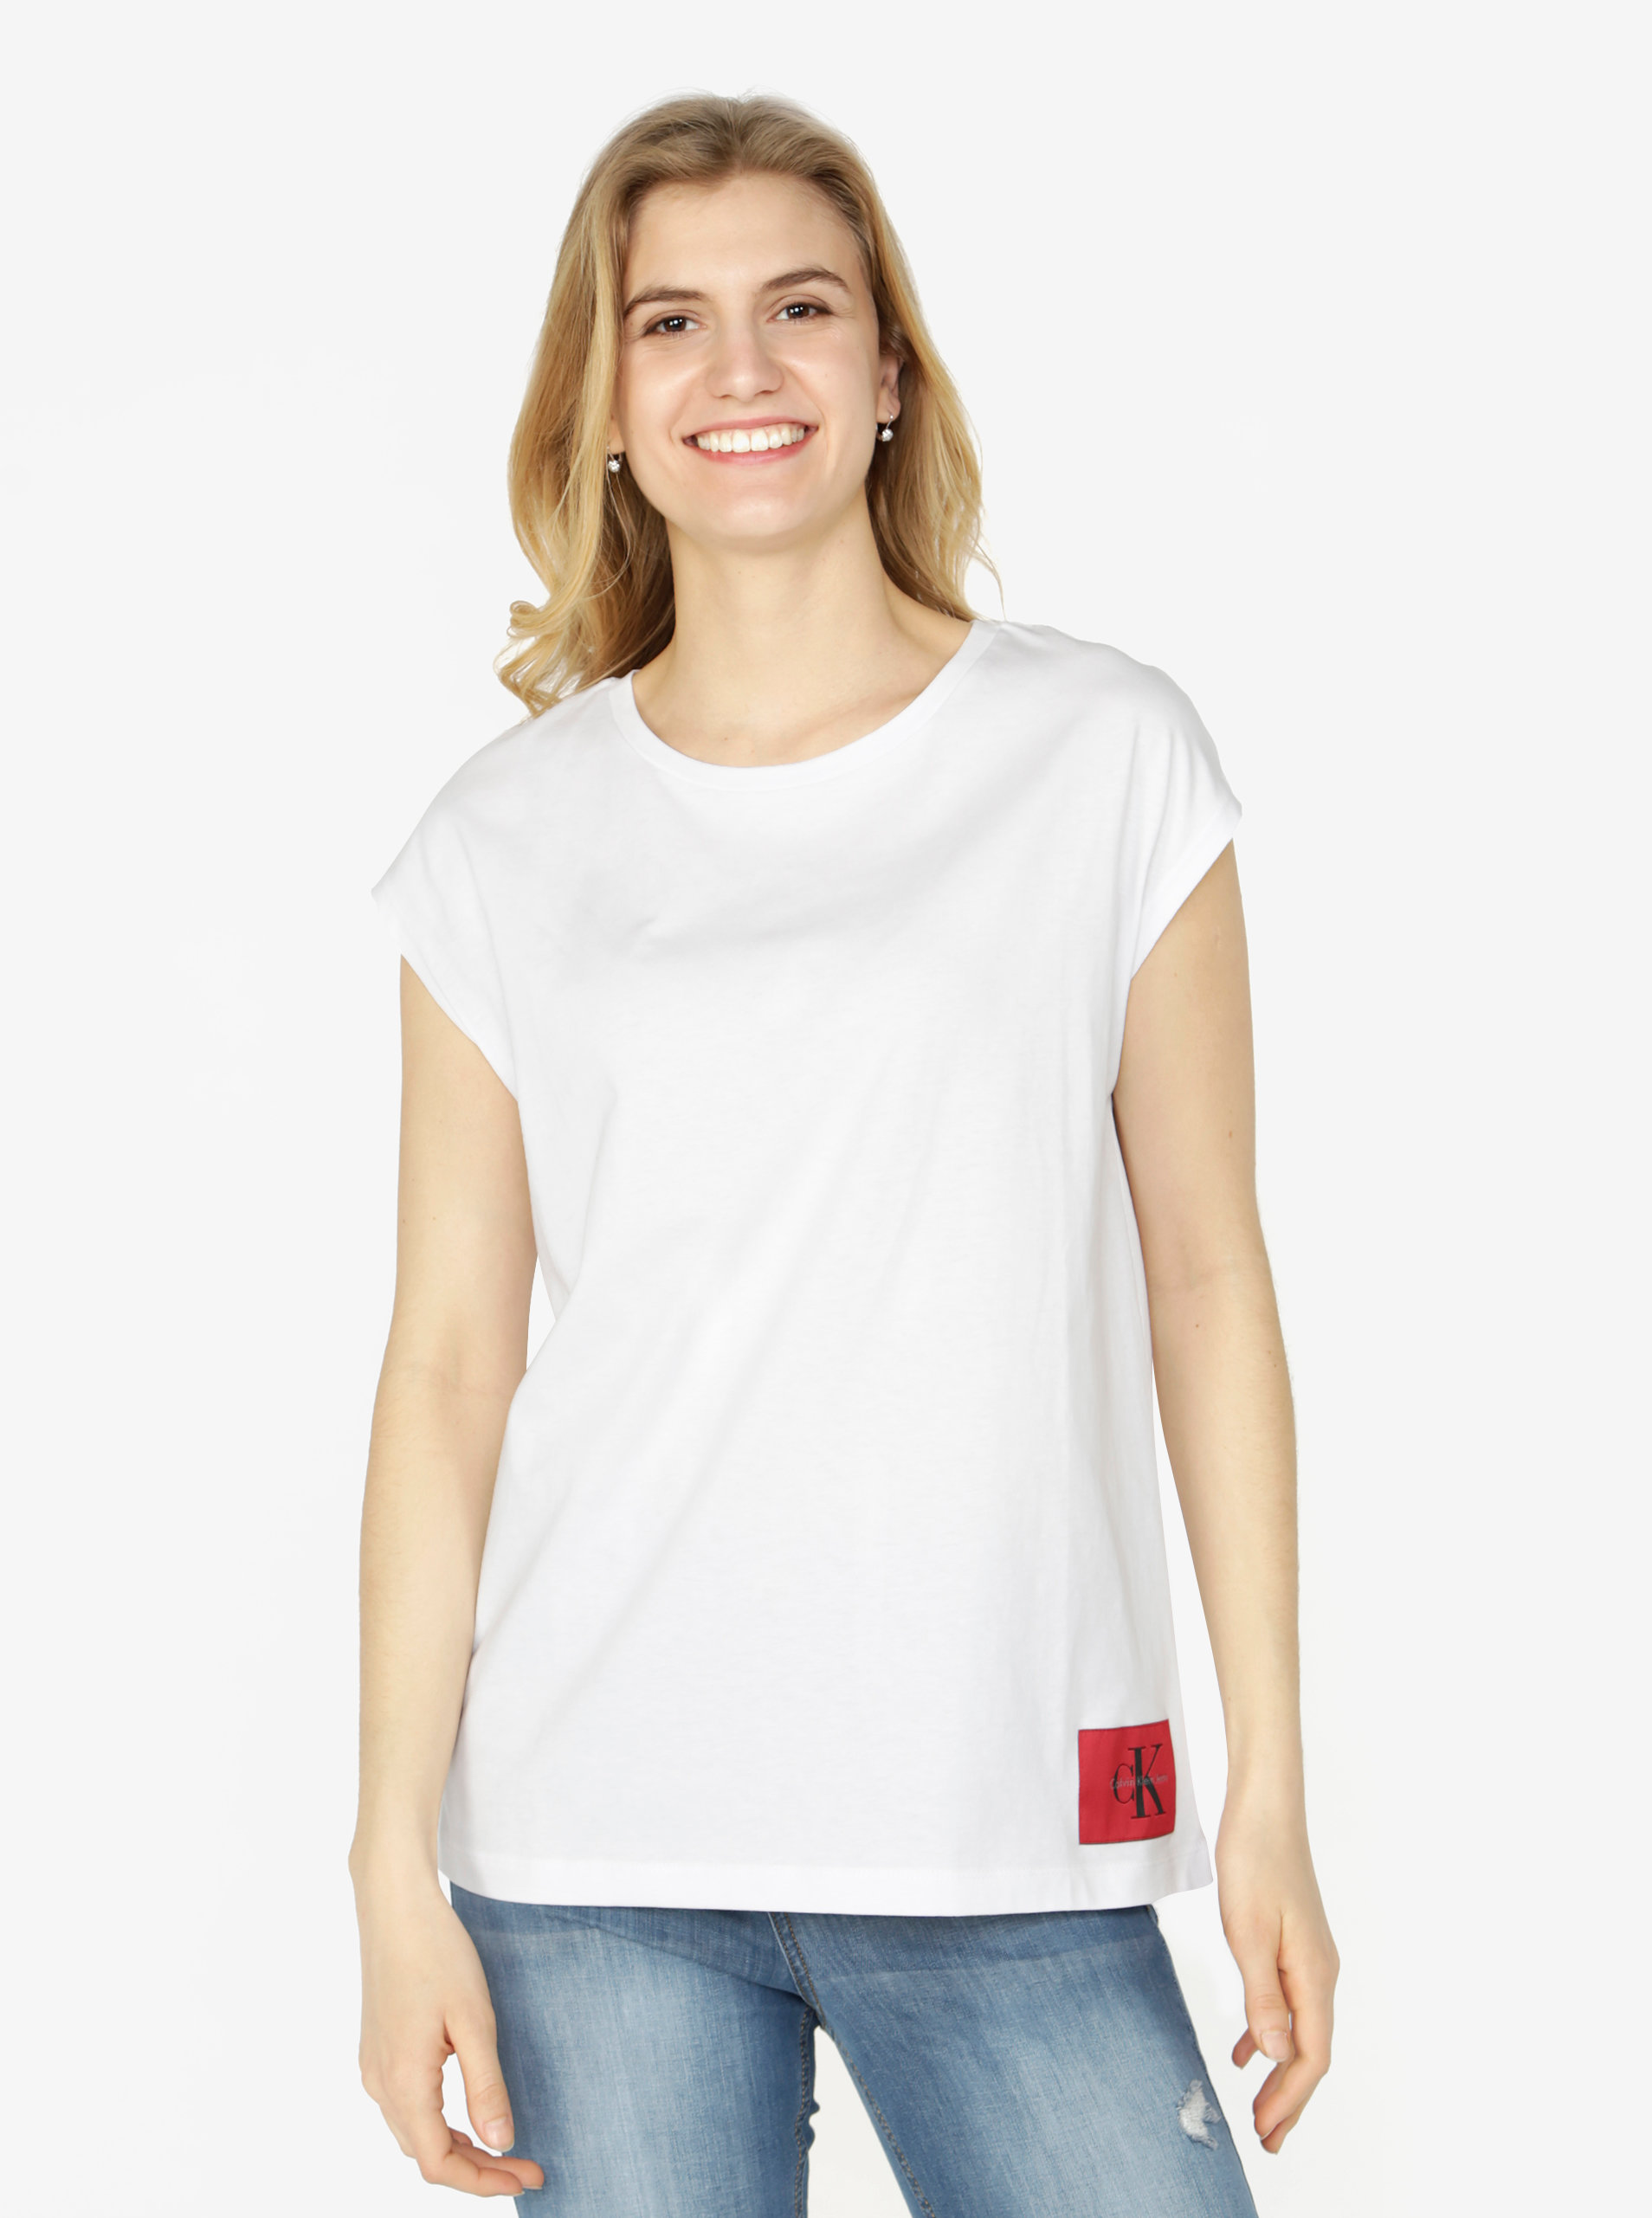 Bílé dámské tričko bez rukávů Calvin Klein Jeans Tika ... 23f7ab97a1